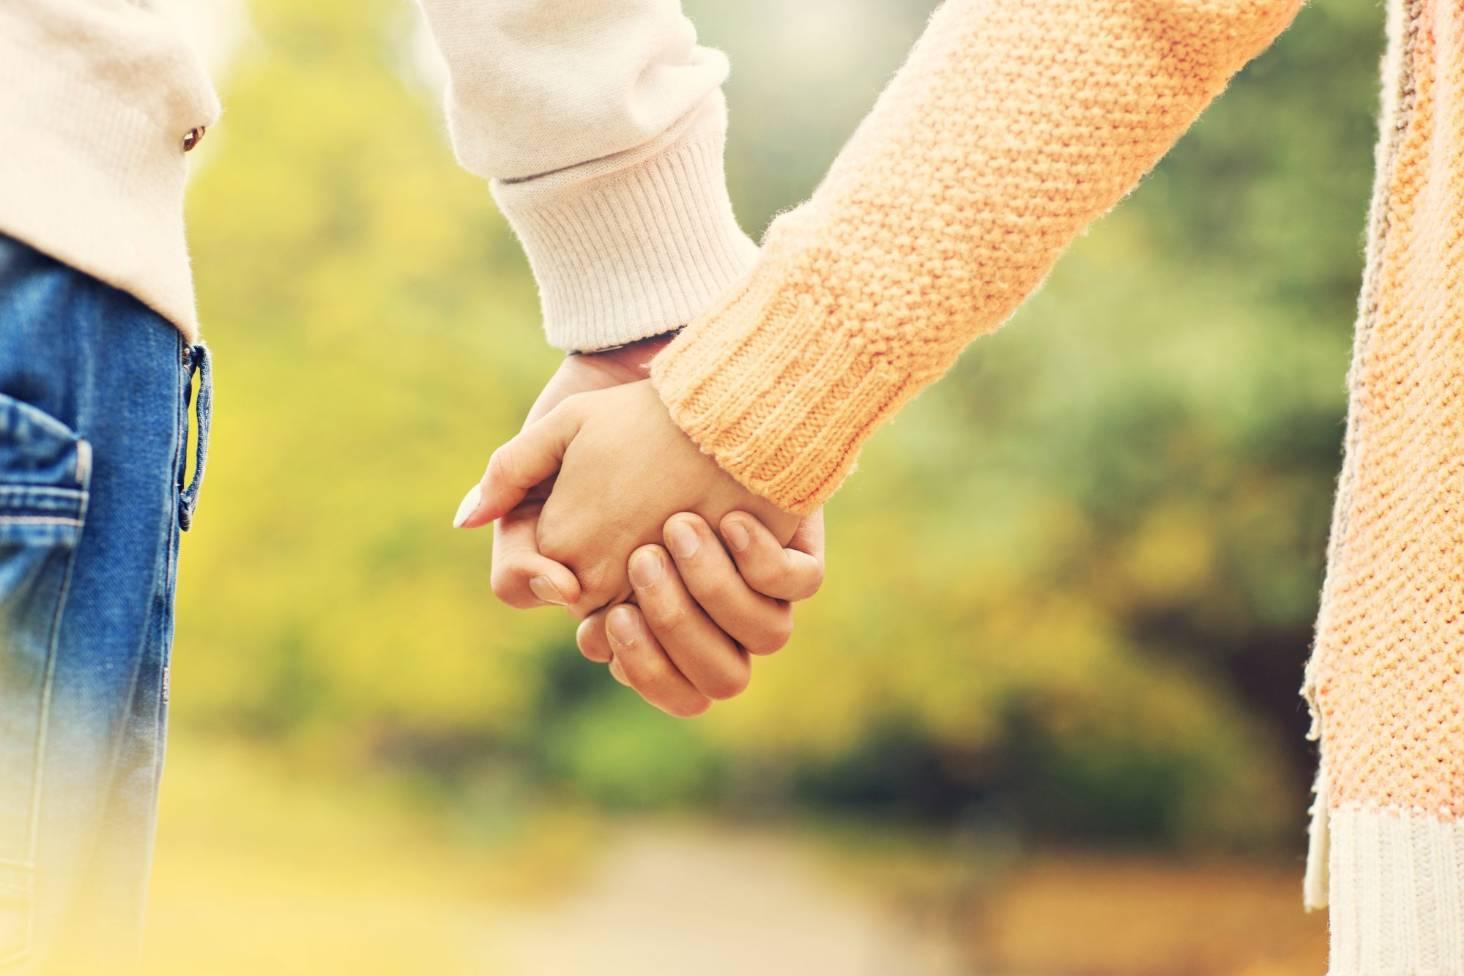 sex dating og relationer app yarmouth dating singler